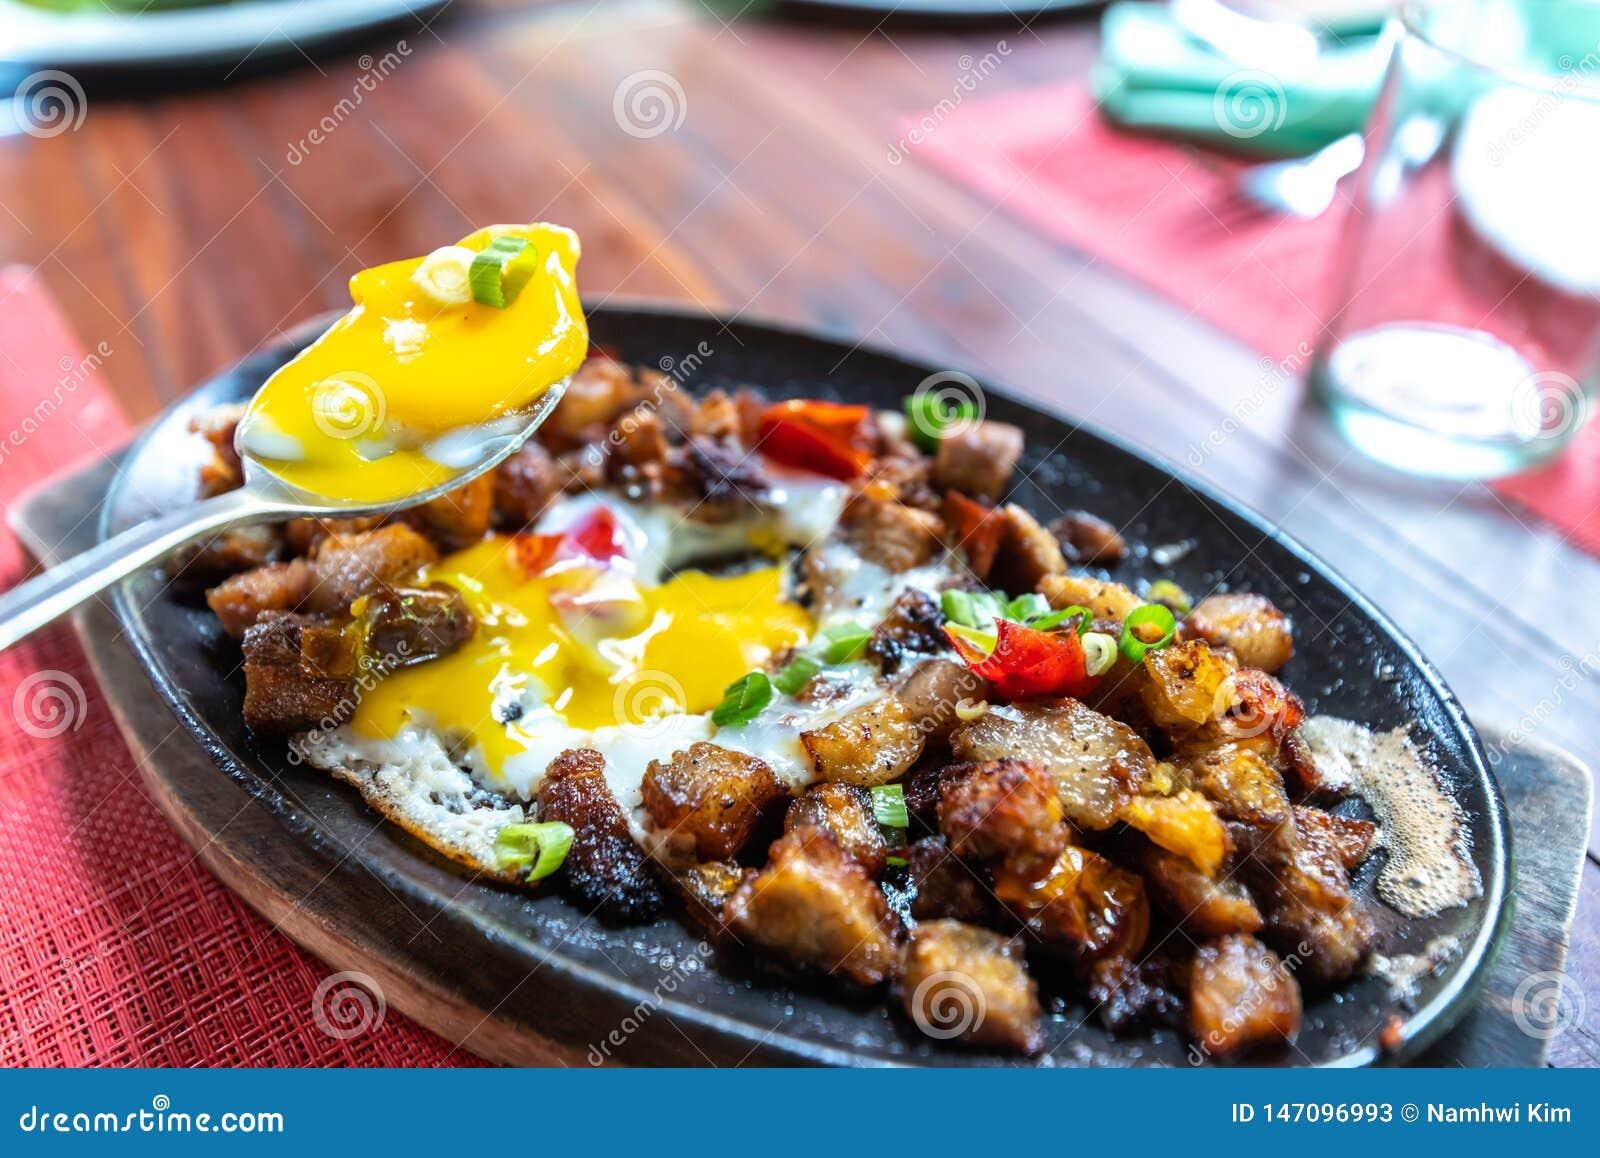 Populaire Filipion-schotel - varkensvlees sisig